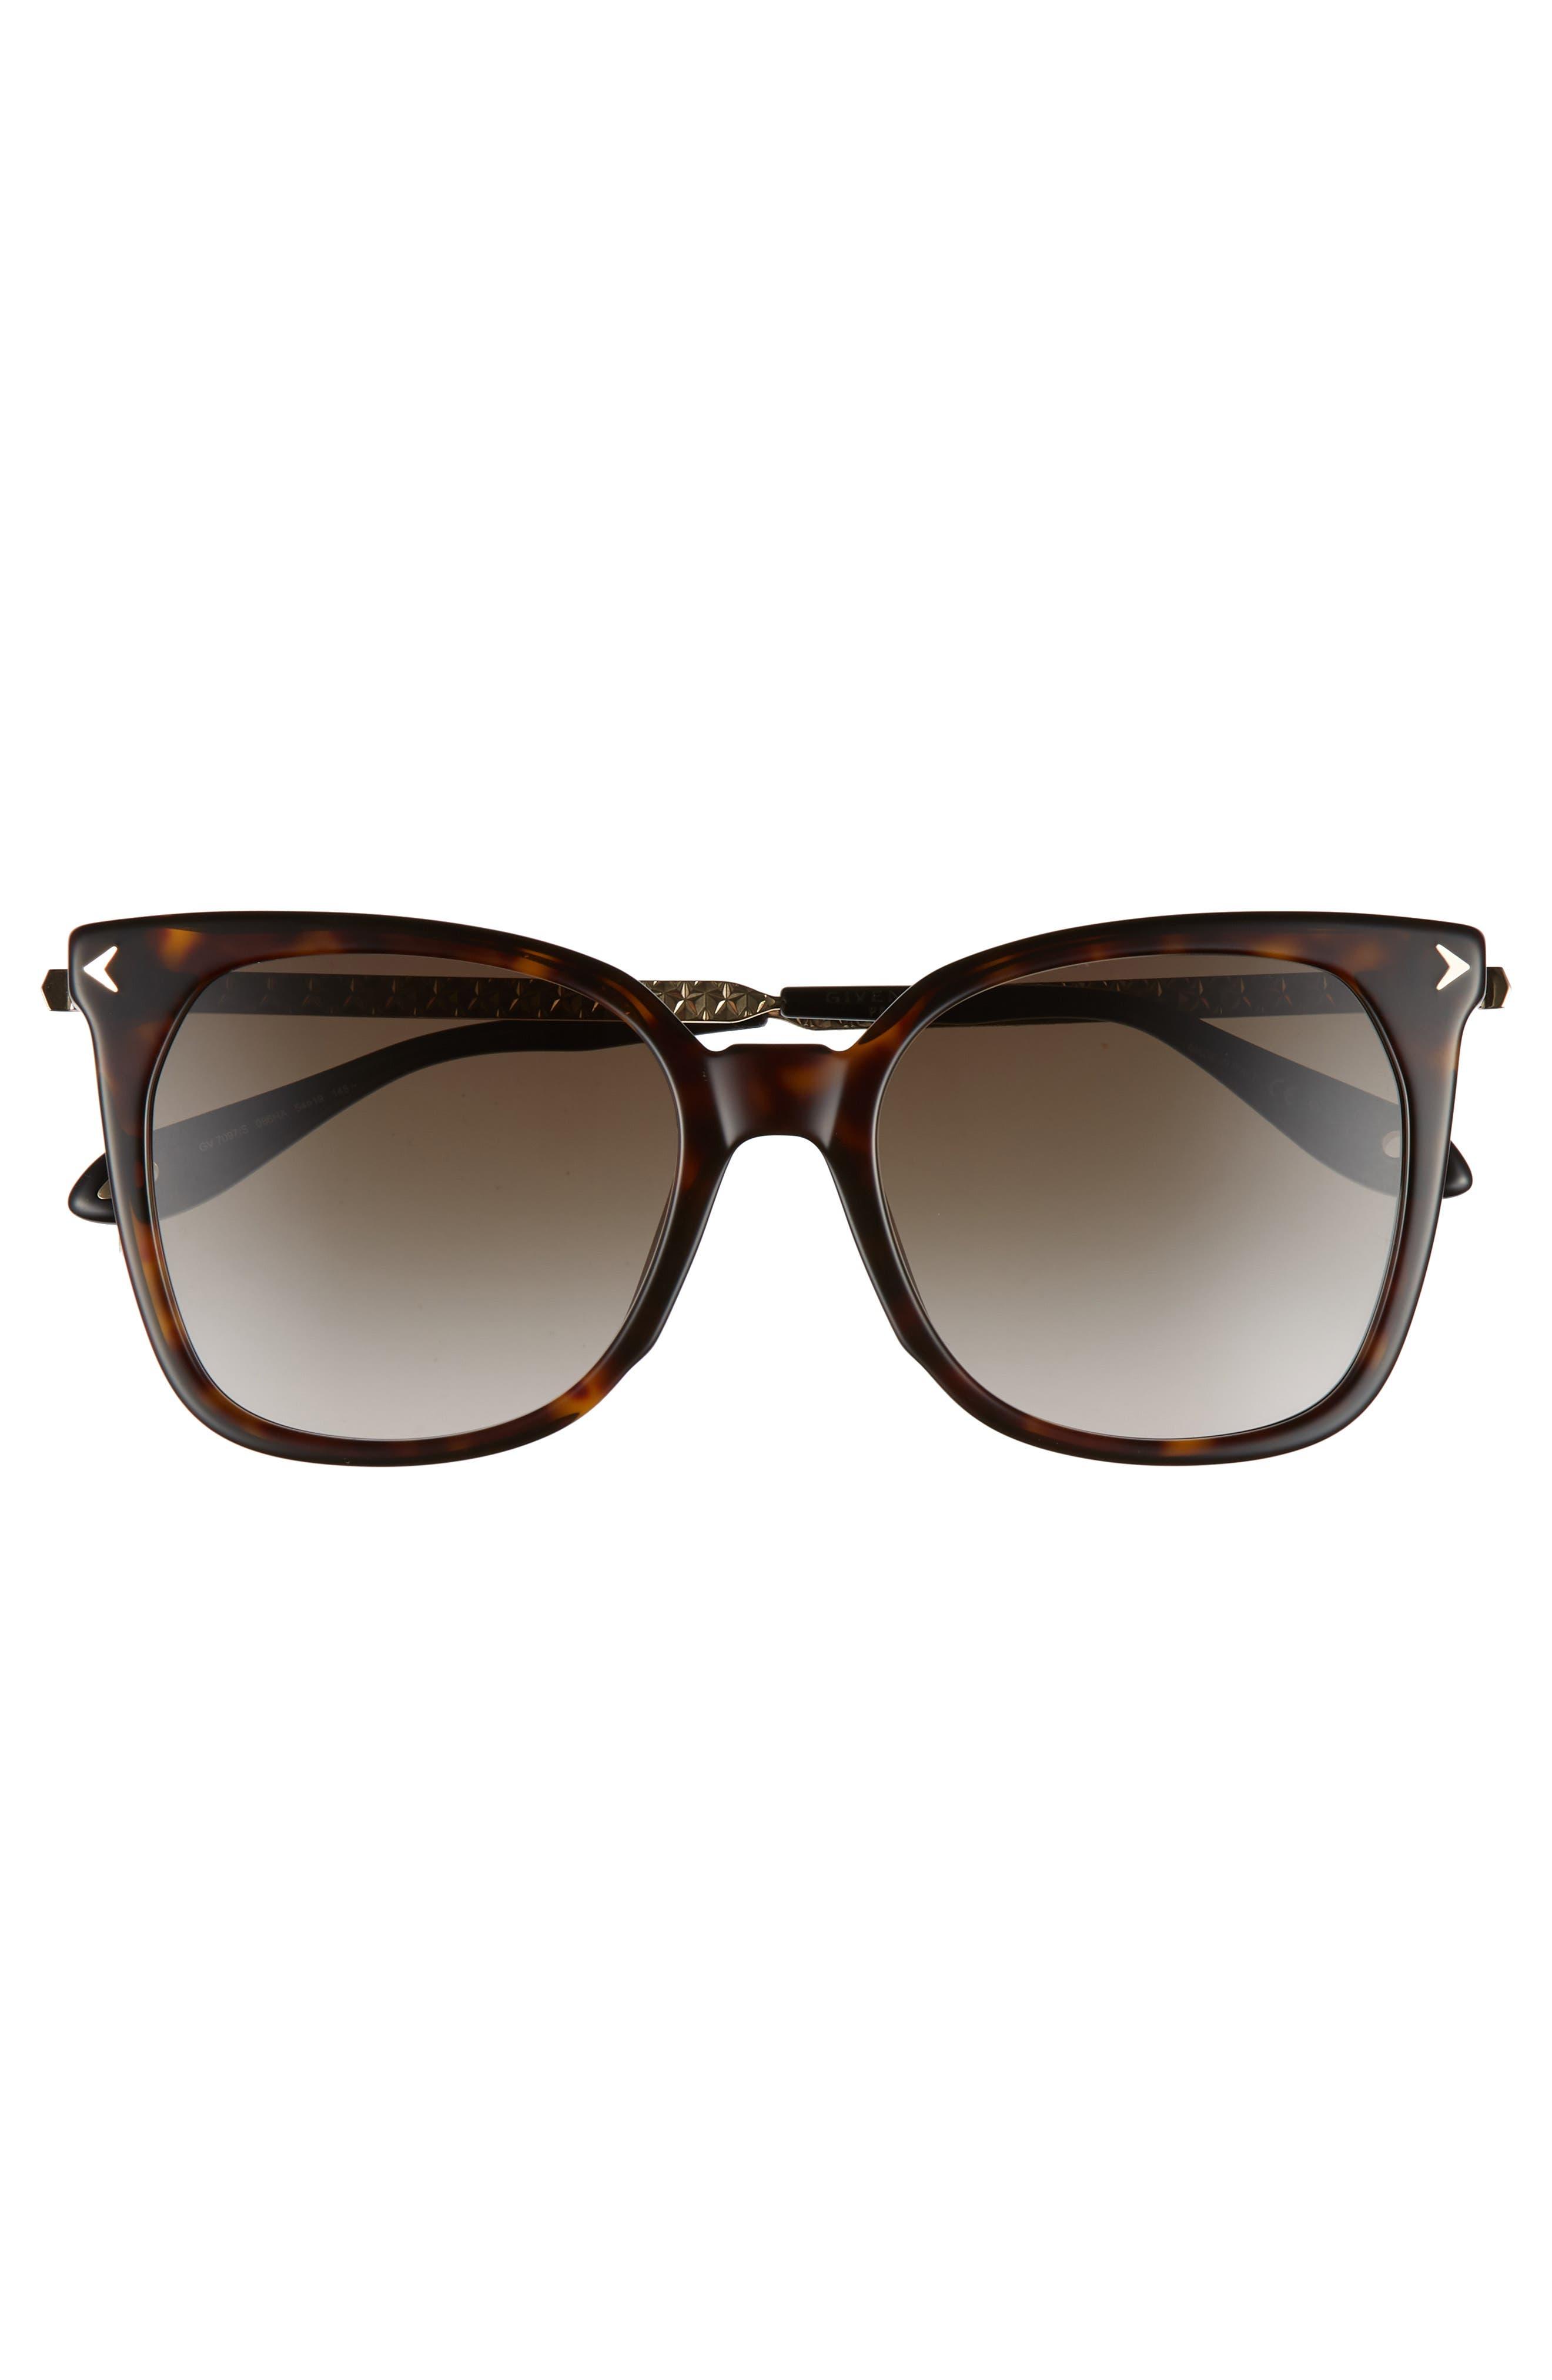 54mm Square Sunglasses,                             Alternate thumbnail 3, color,                             Dark Havana